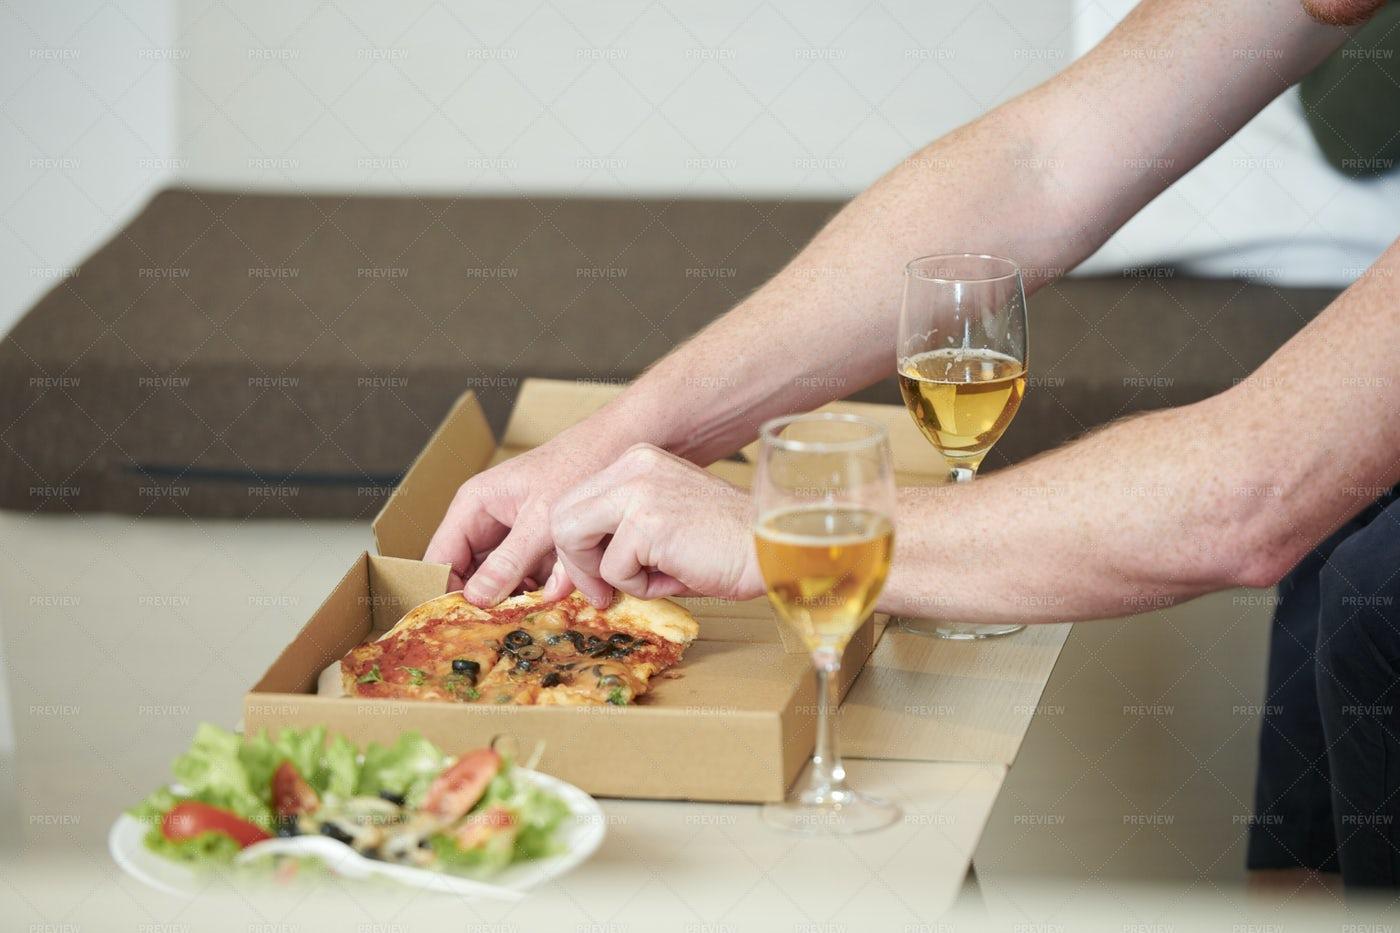 Man Taking Slice Of Pizza: Stock Photos